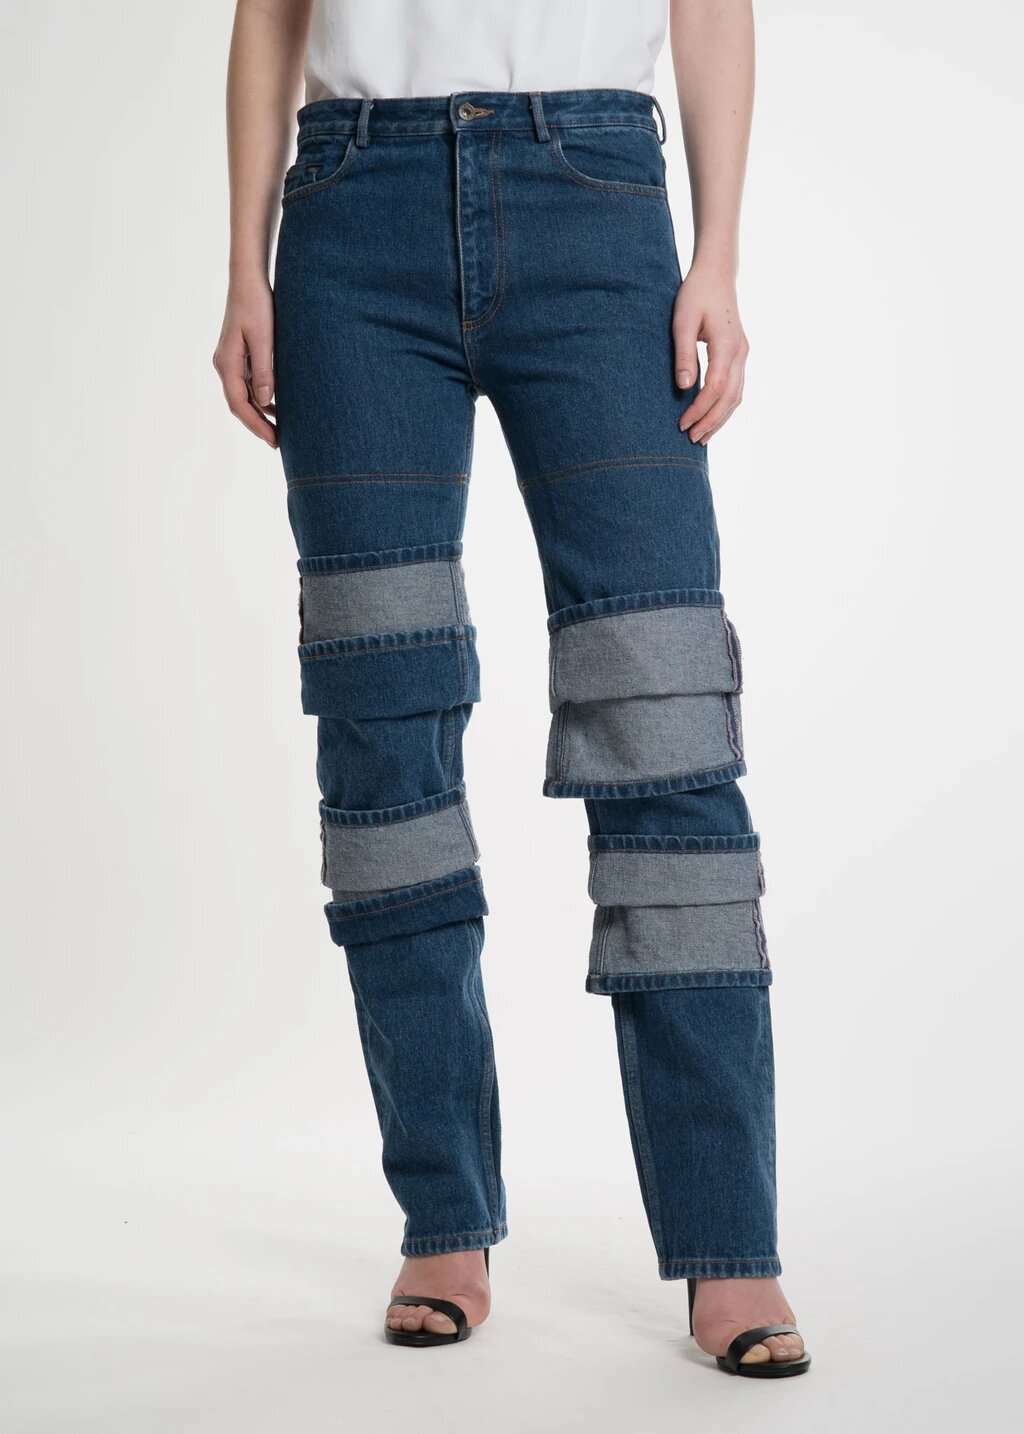 funny pant thread work